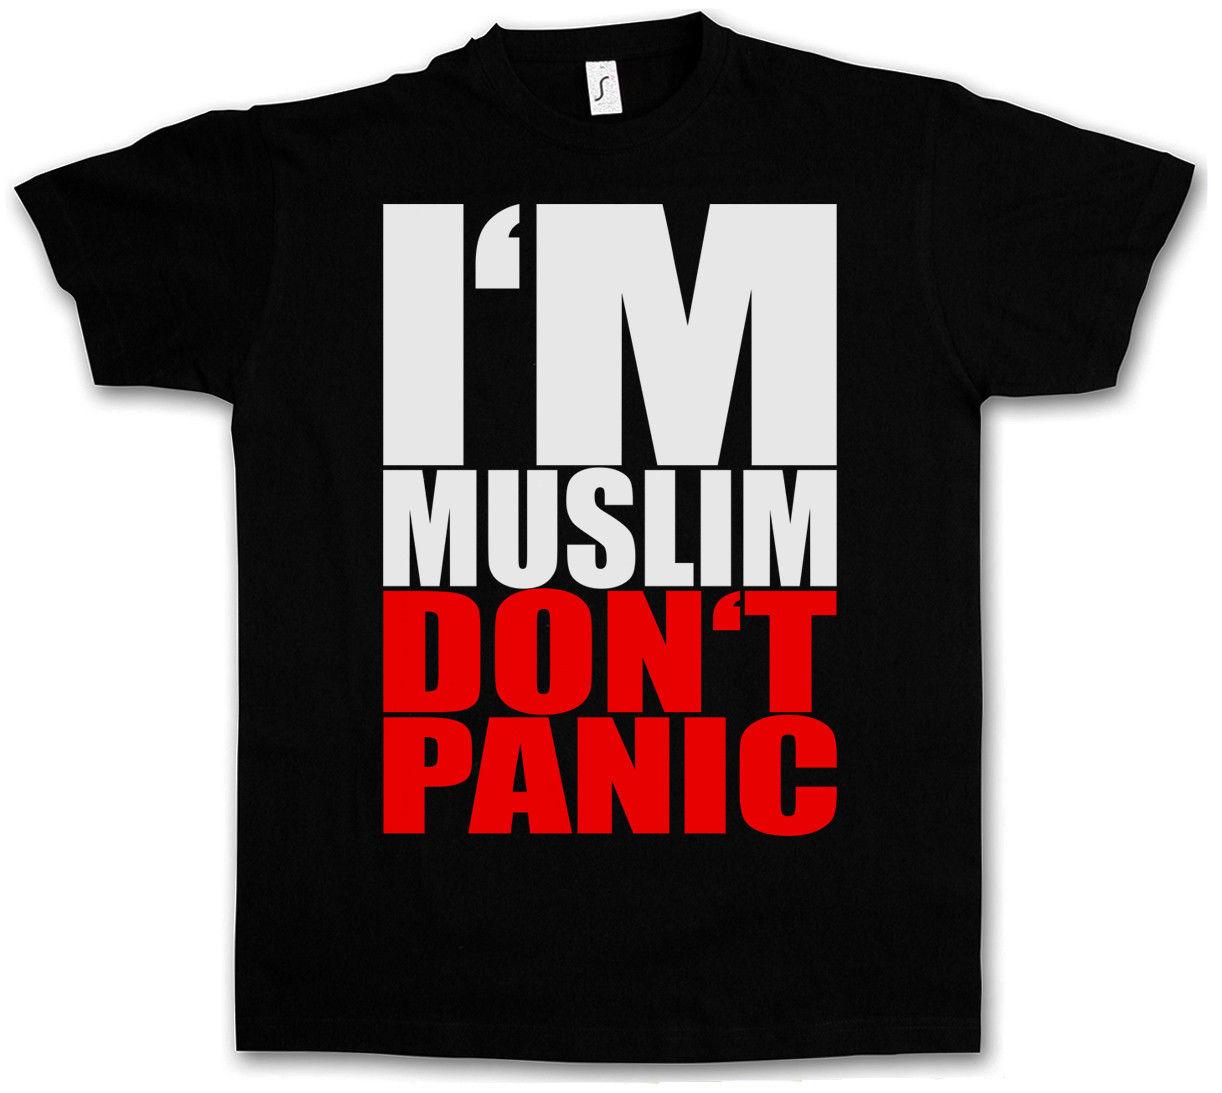 I AM MUSLIM DO NOT PANIC II T-SHIRT - Islam Moslem Religion Turkei Istanbul Allah